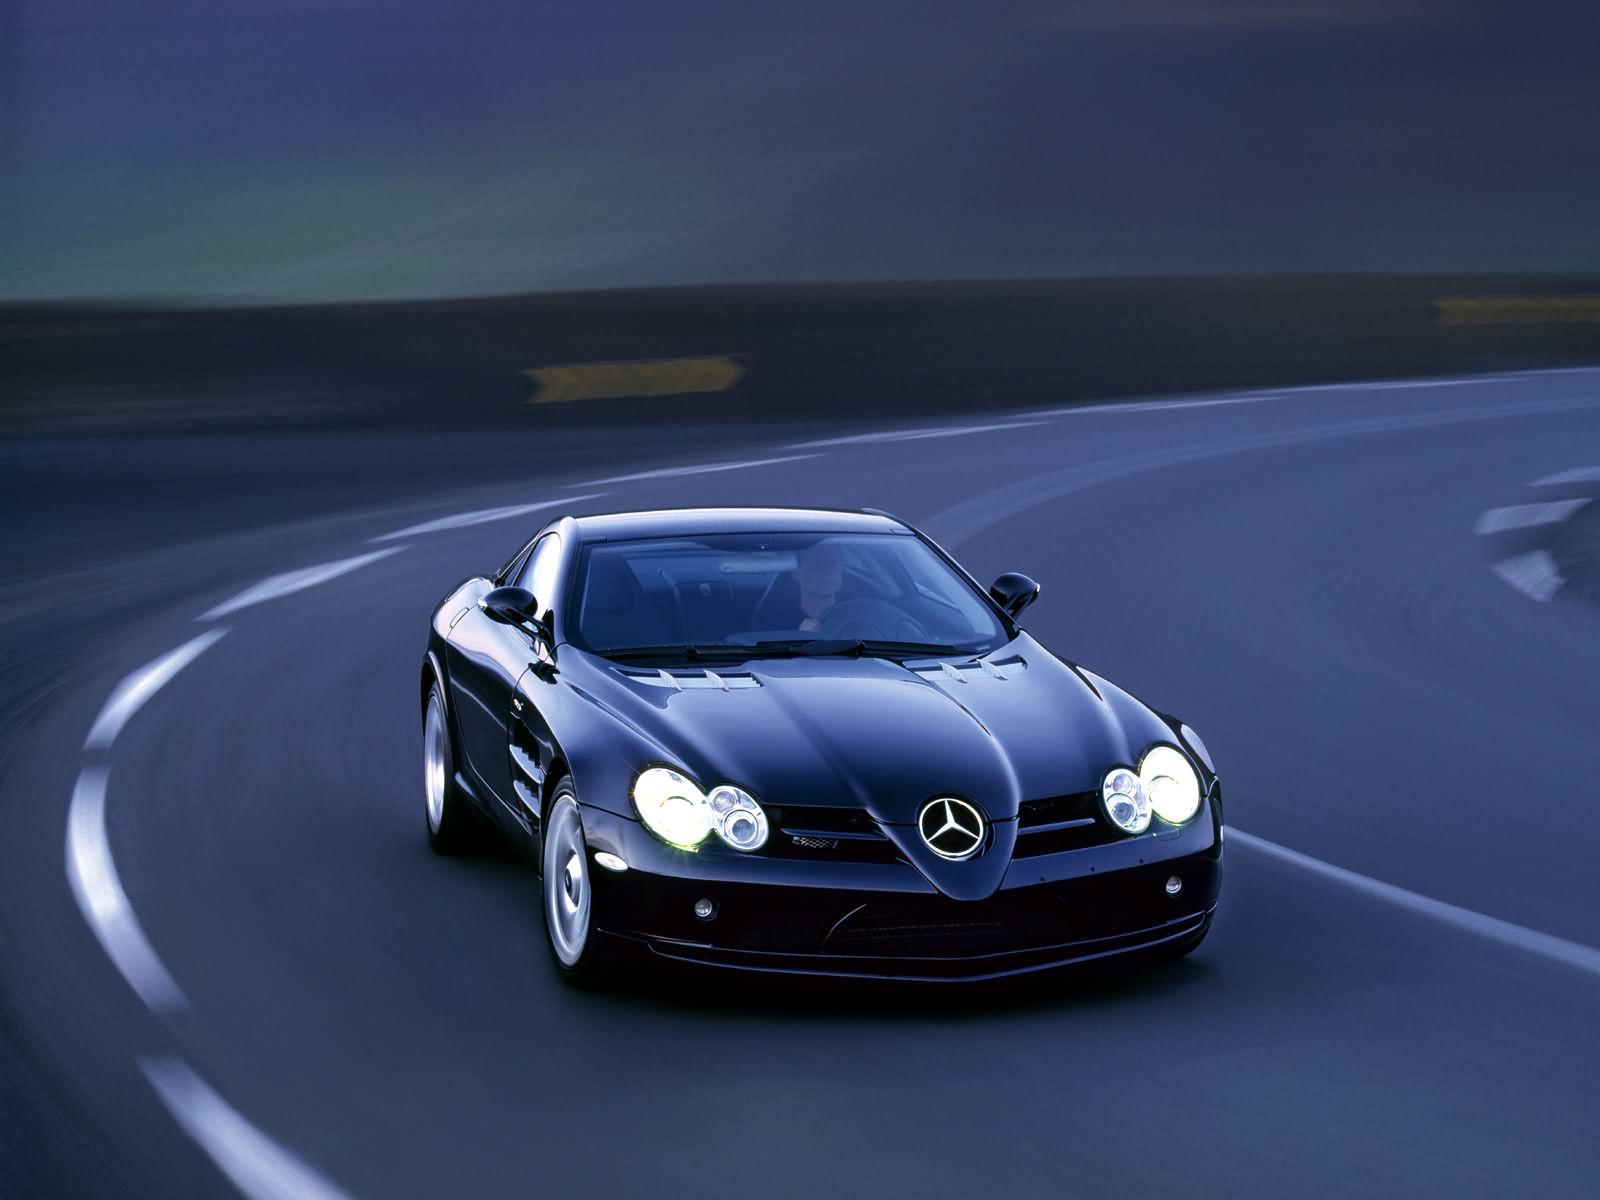 http://3.bp.blogspot.com/-Y2cIZNUCrxw/To6rx09GrqI/AAAAAAAAEGw/Da3DyWsMTC0/s1600/mercedes-benz-slr-sports-car-20.jpg